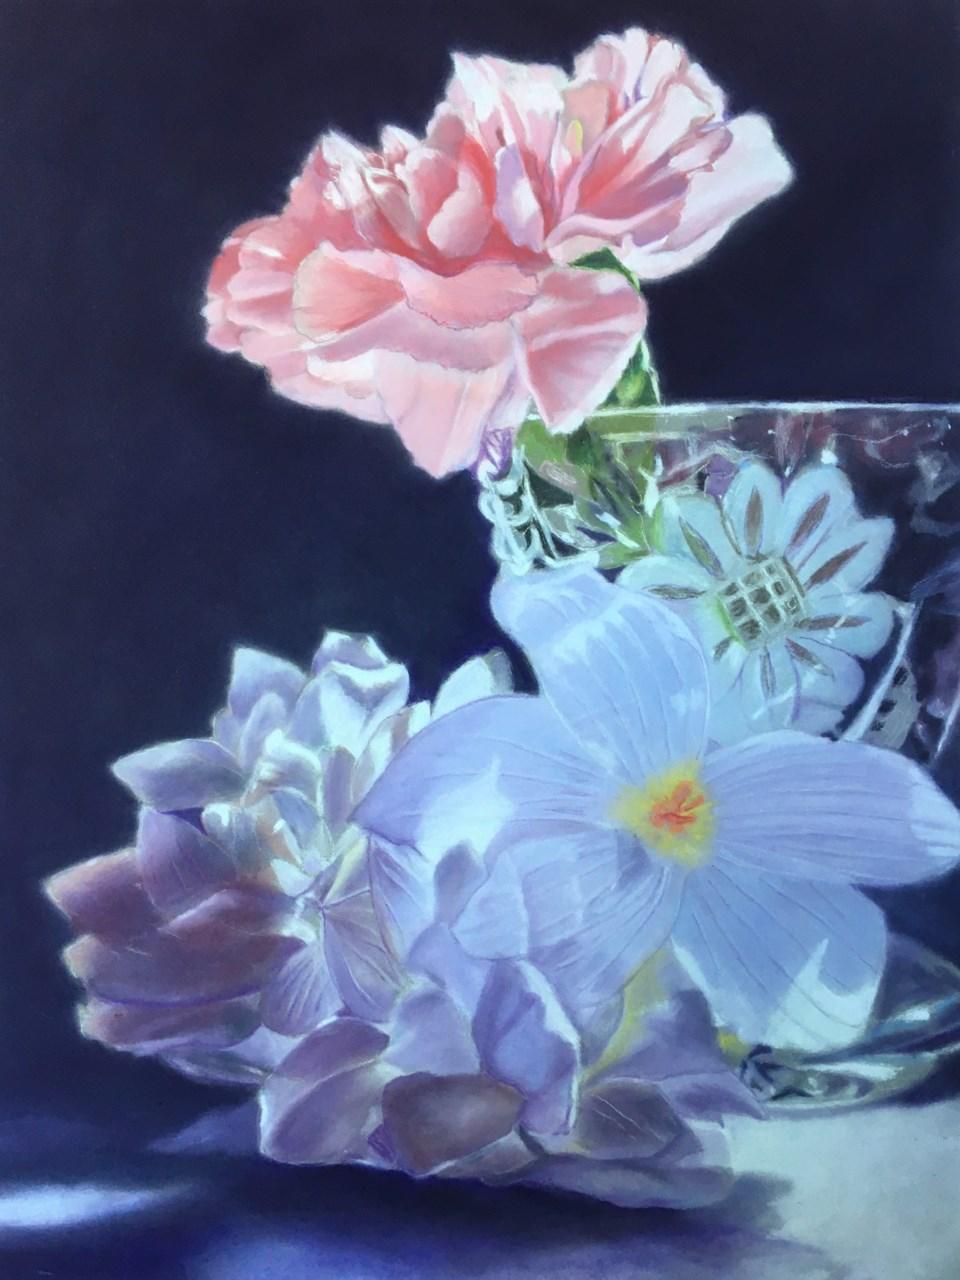 Menchu Abel's flower and vase